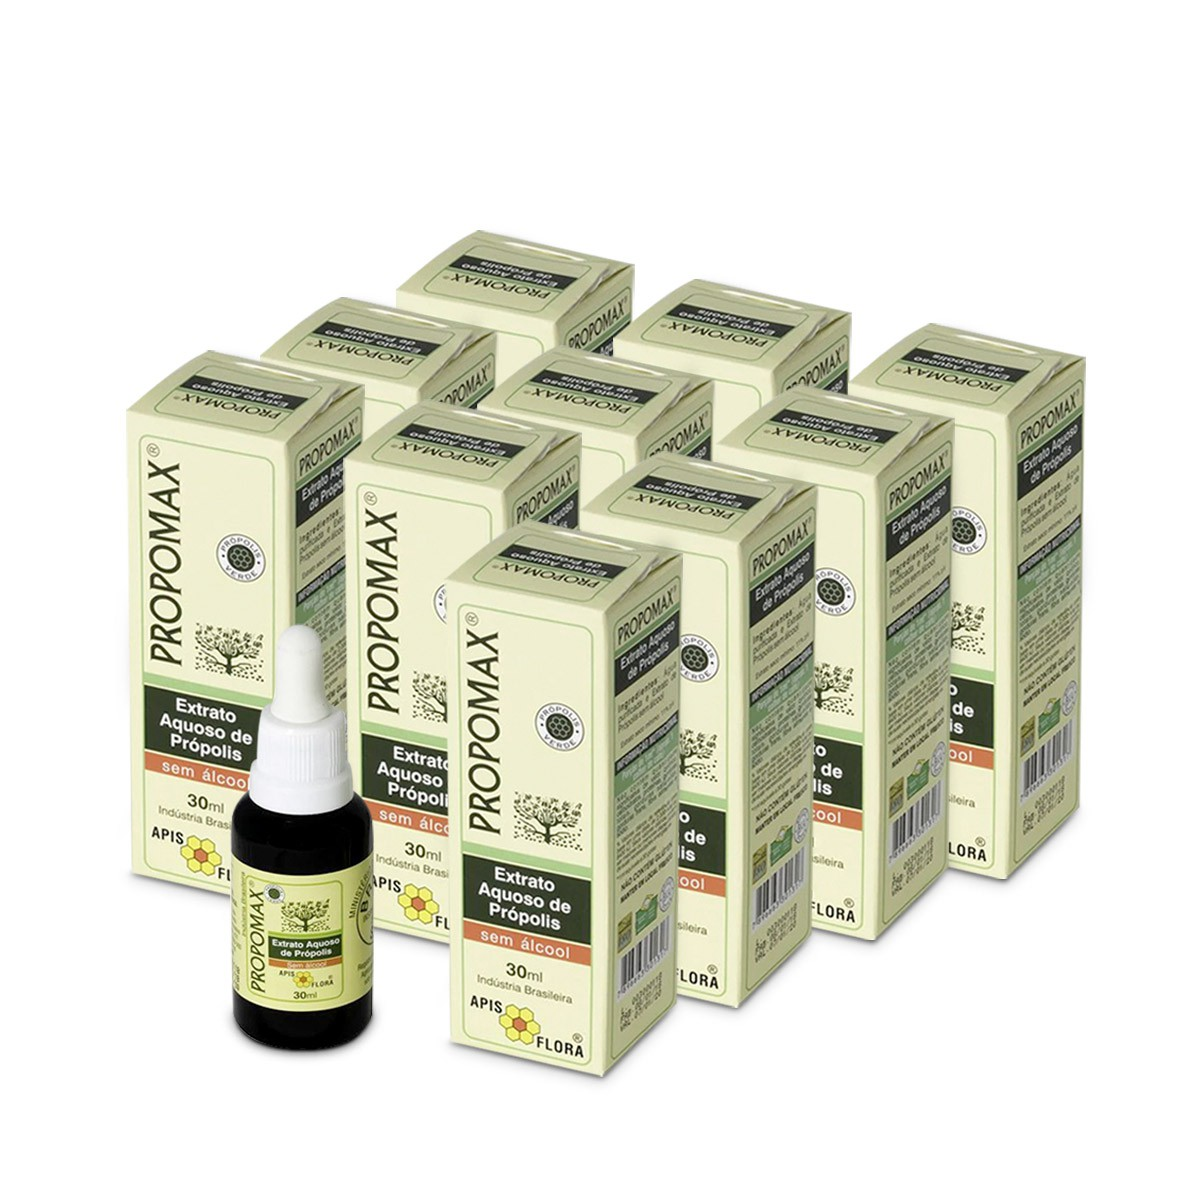 Kit 10 Propomax Extrato de Própolis Aquoso Sem Álcool